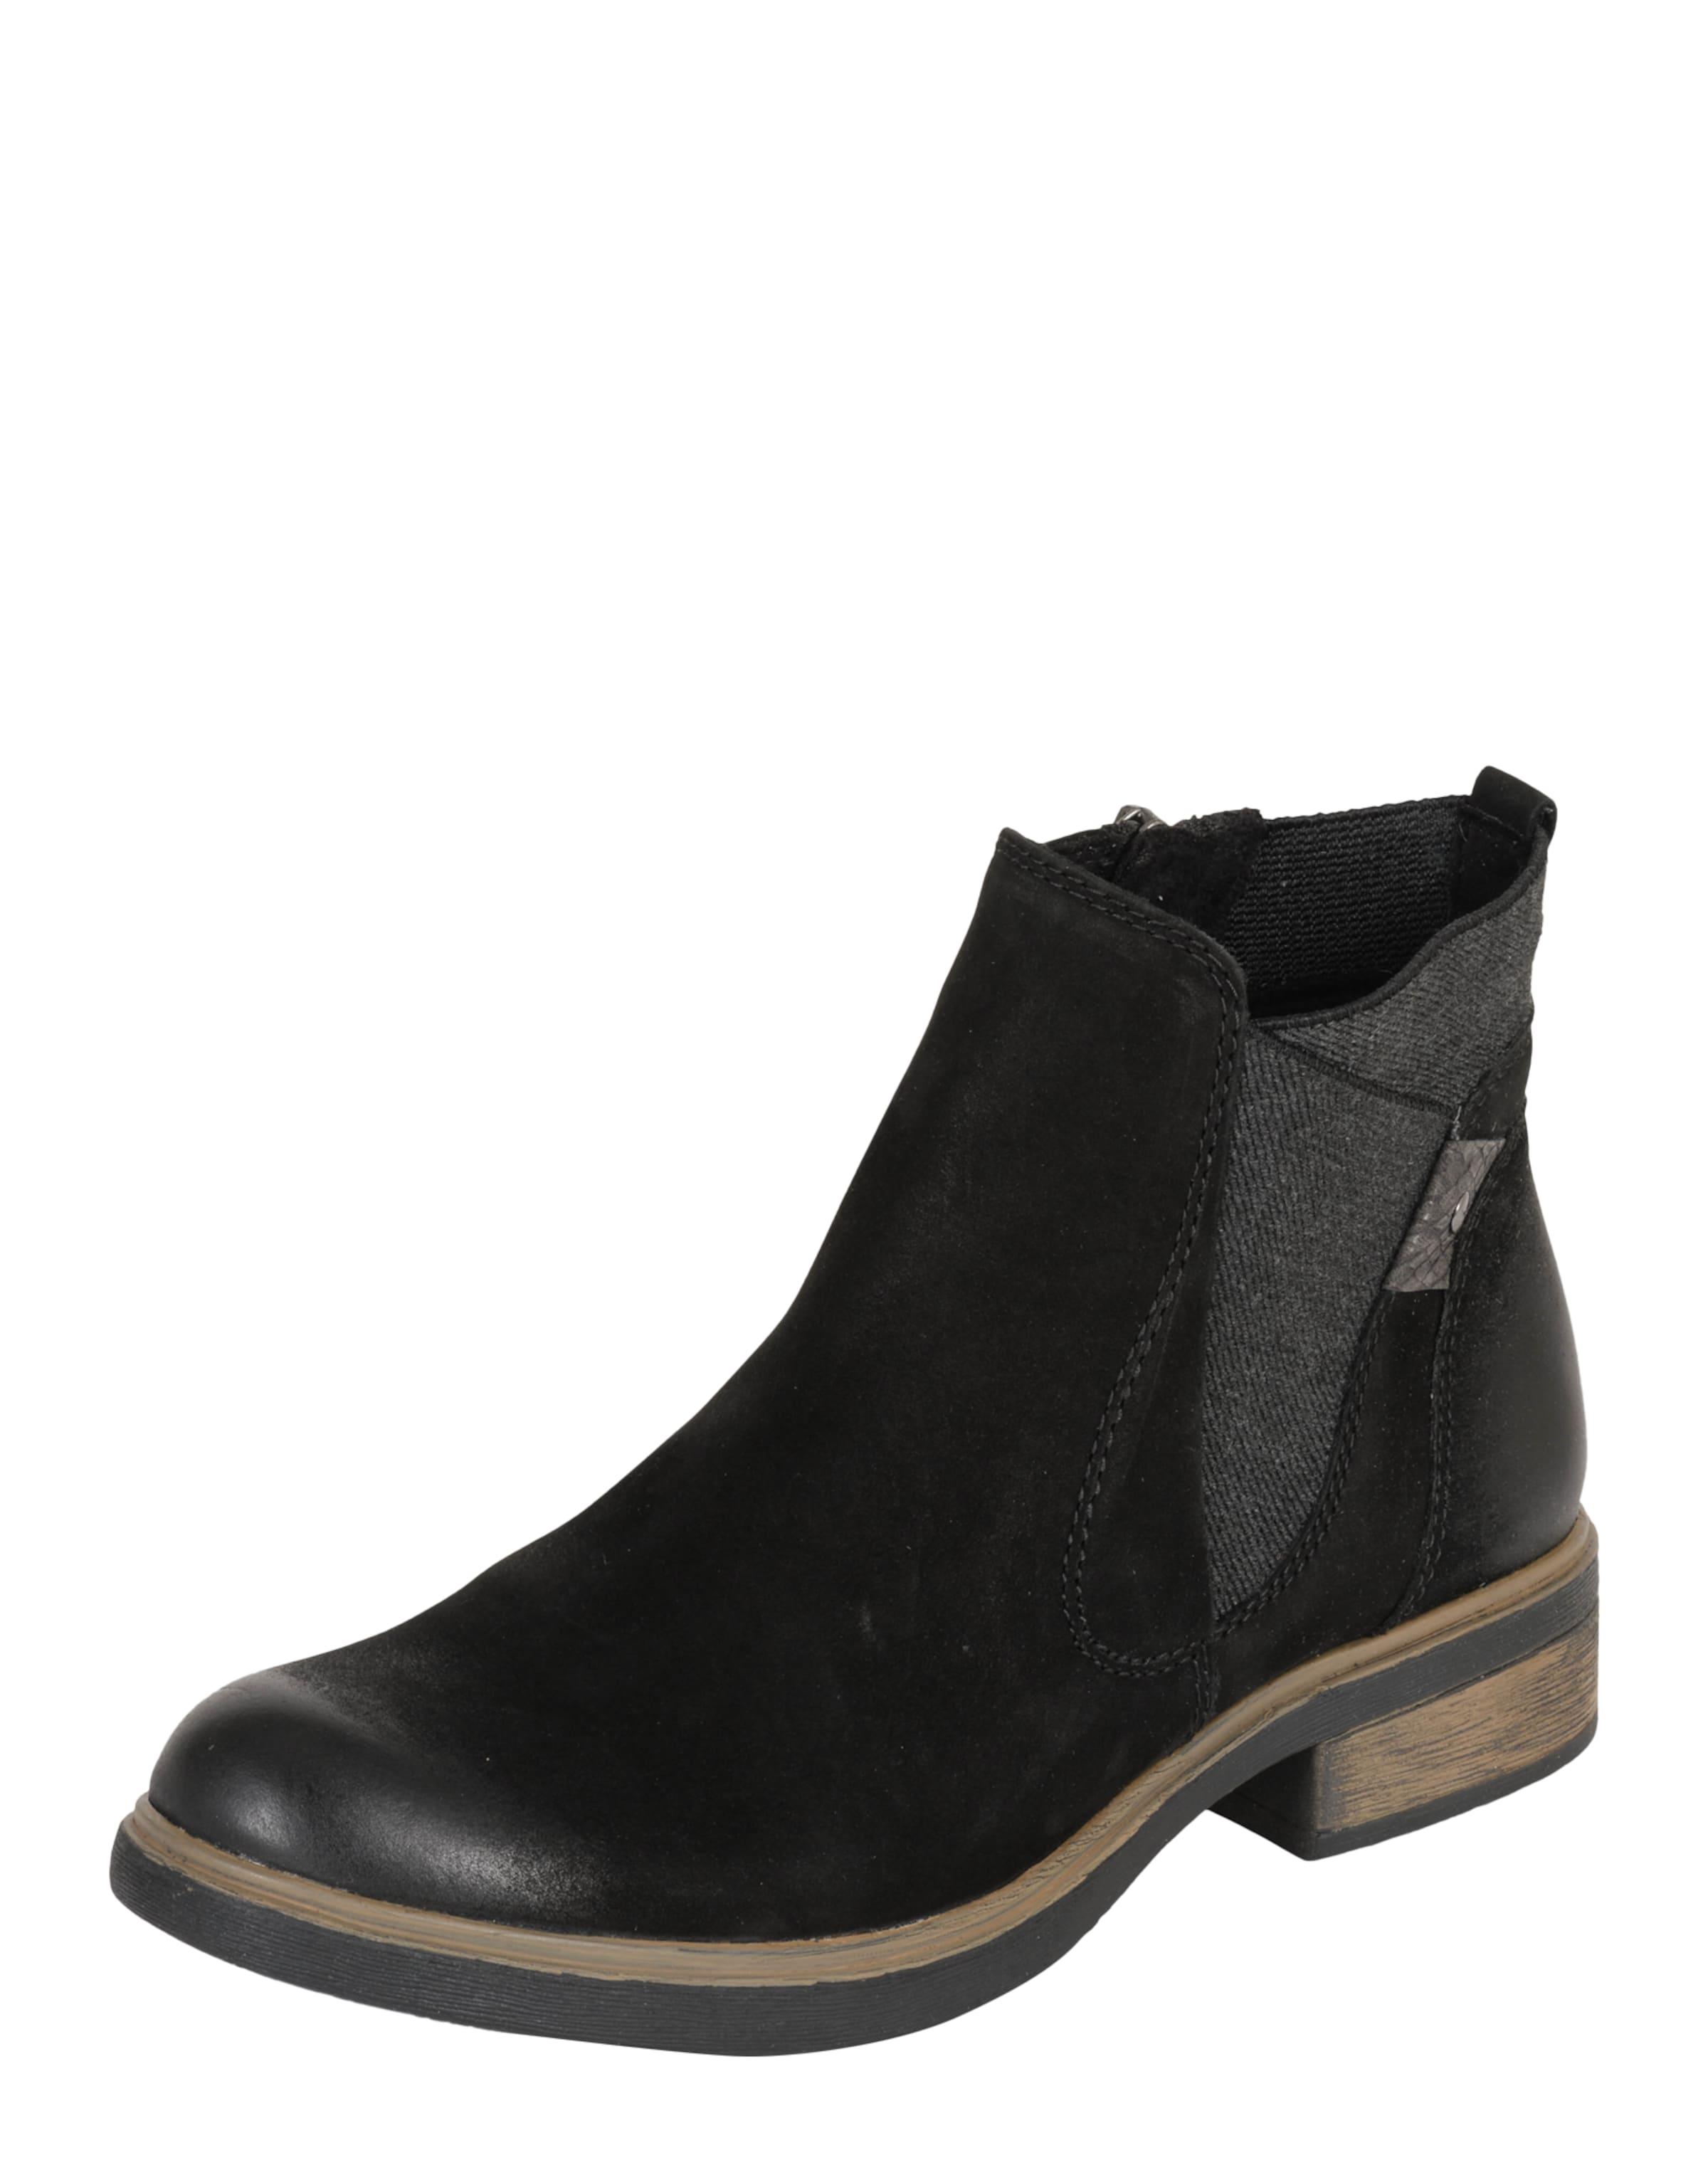 TAMARIS Chelsea-Boots Chelsea-Boots TAMARIS Günstige und langlebige Schuhe 71cfd8